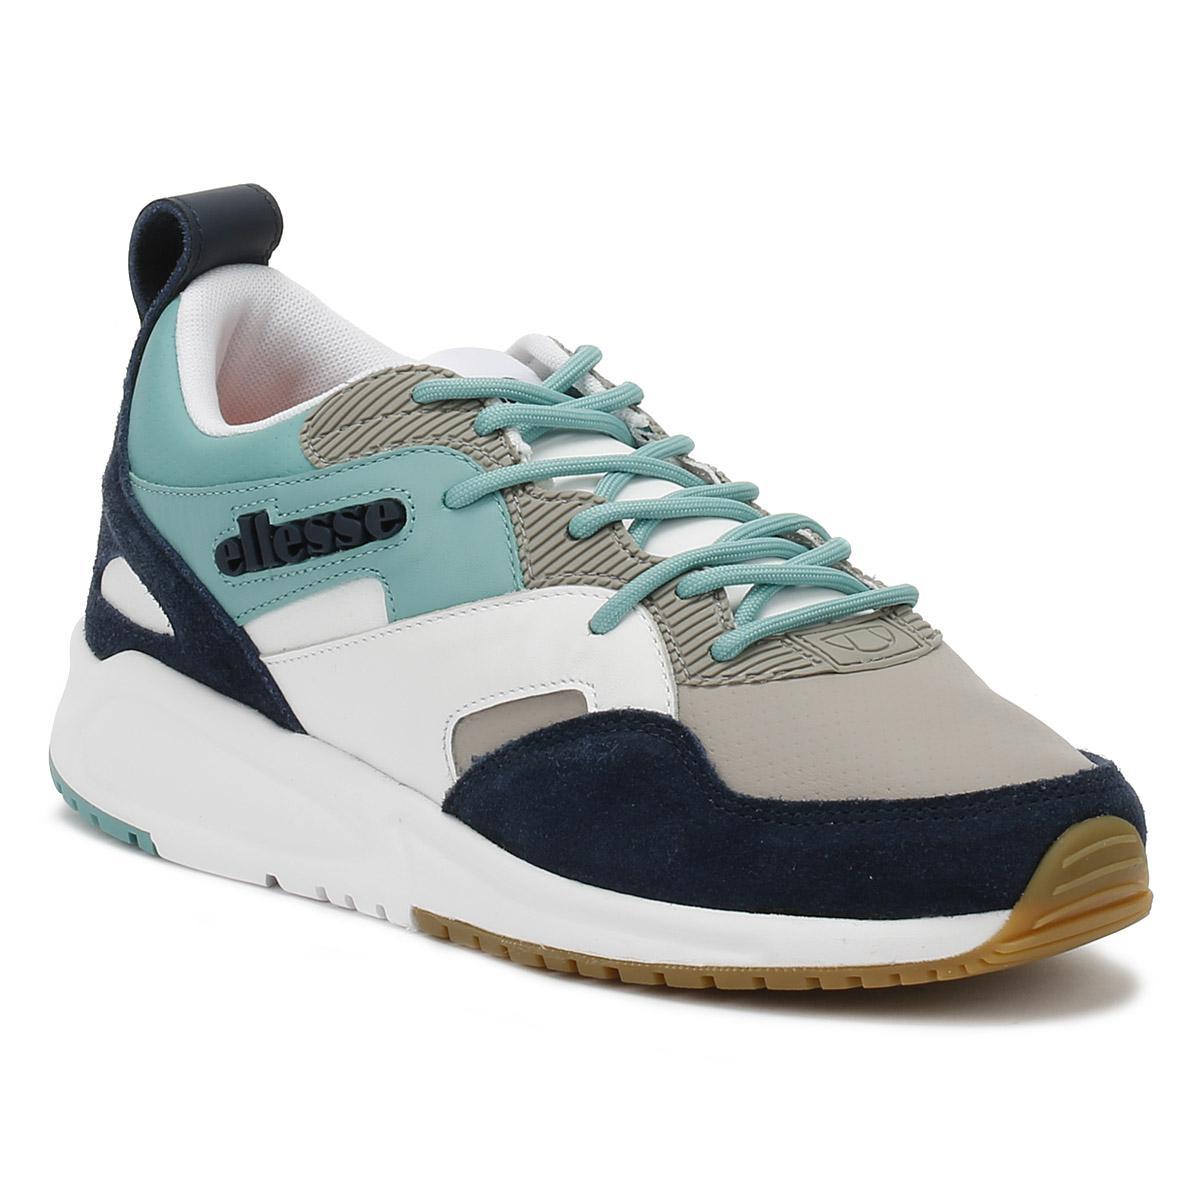 66f198e30d Blue Potenza Mens Navy / White Sneakers